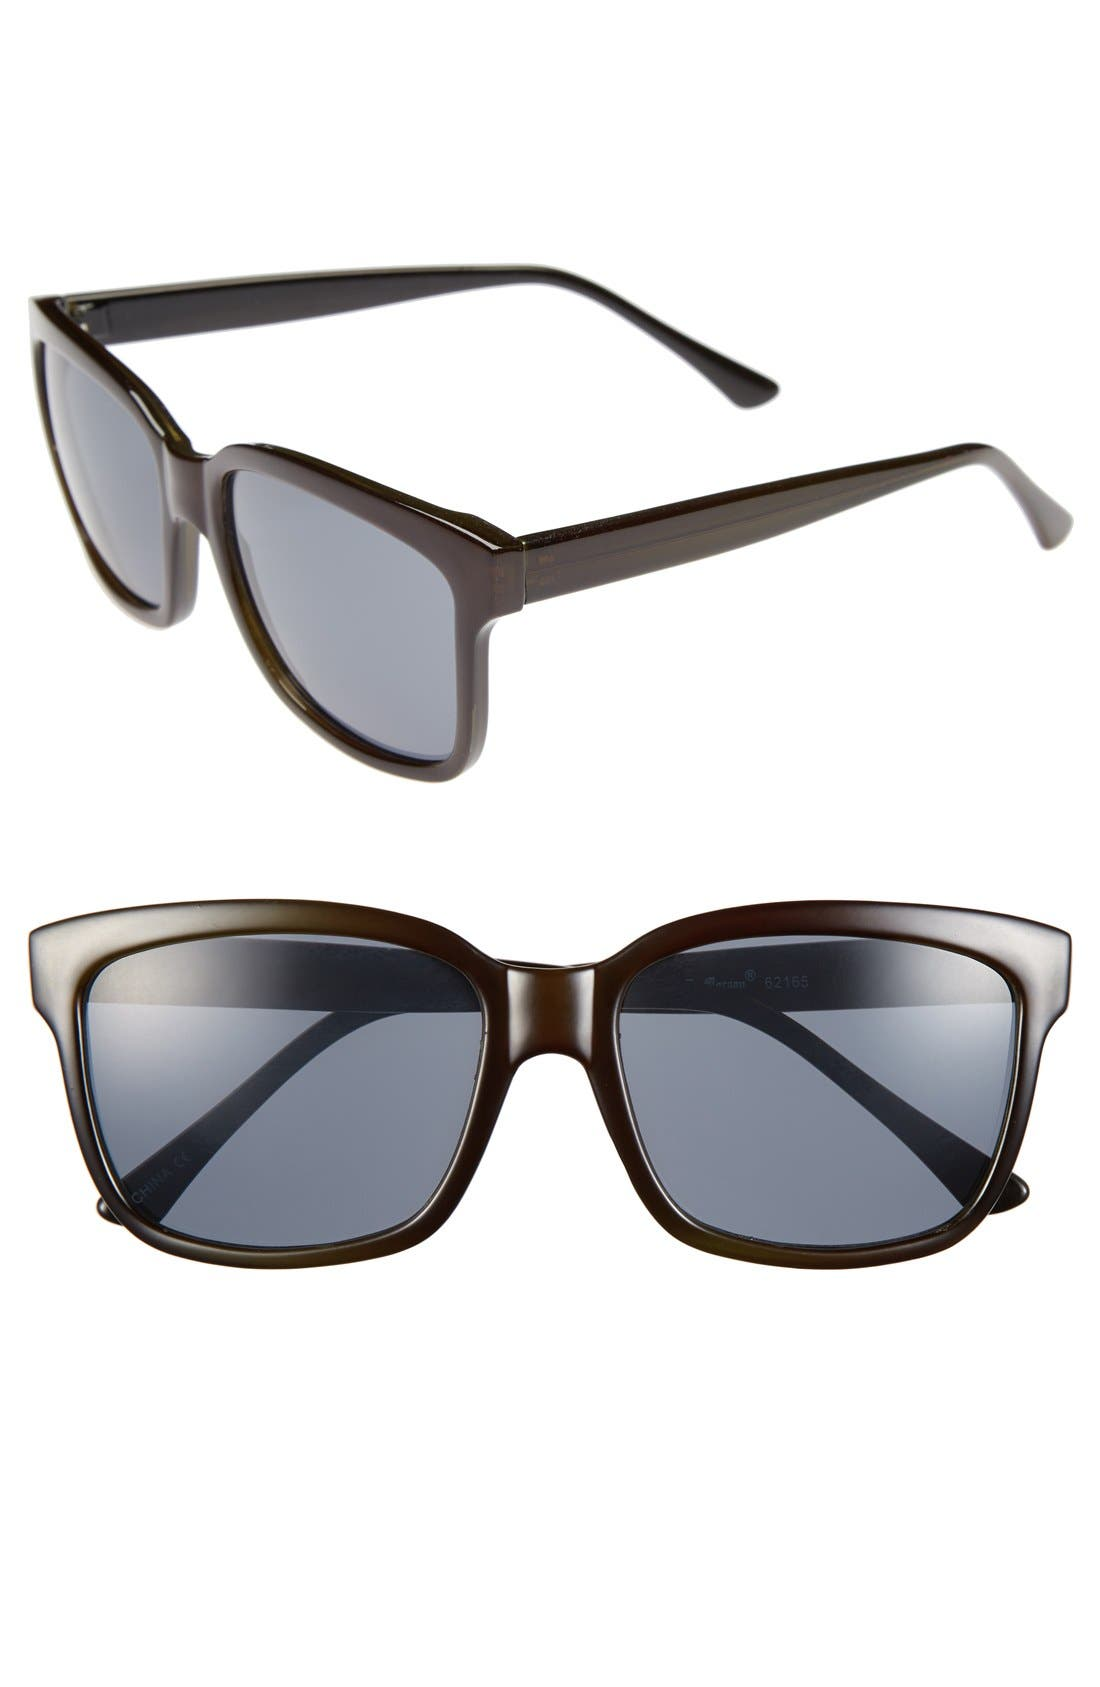 Main Image - A.J. Morgan 'Beechers' 55mm Sunglasses